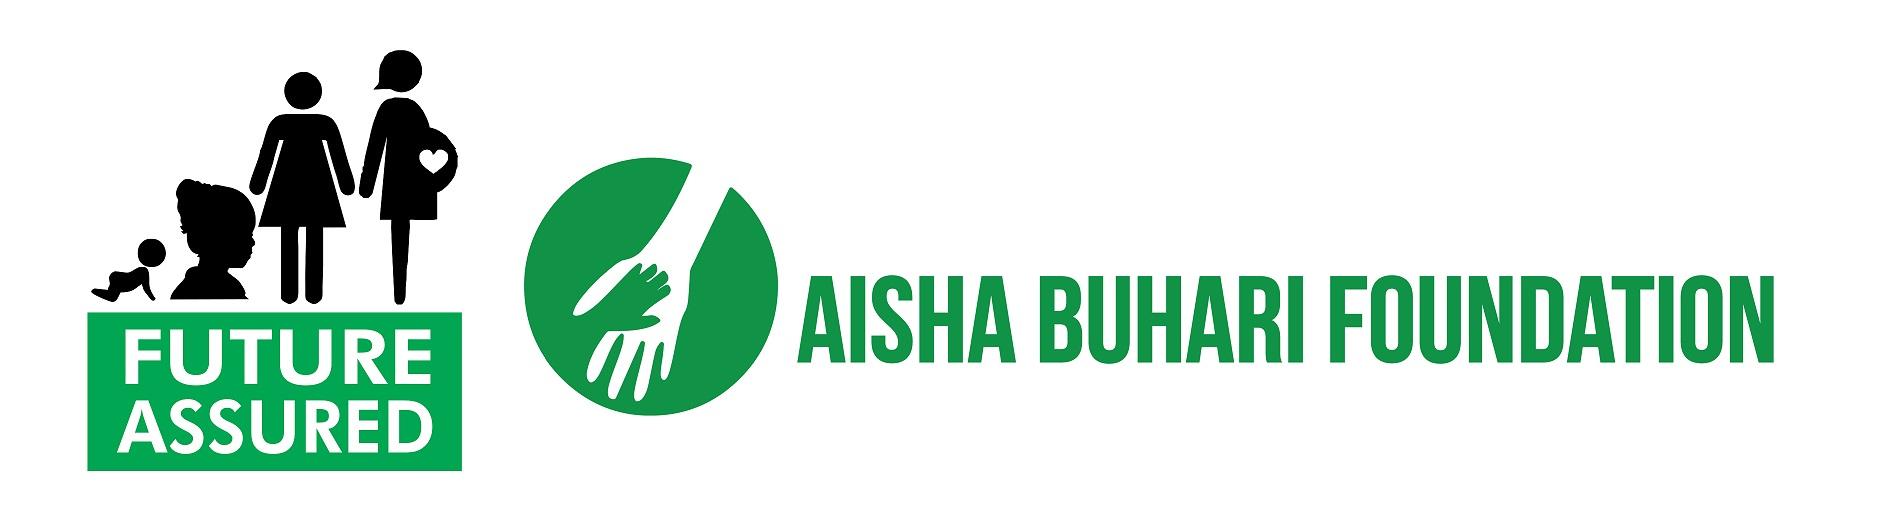 Aisha Buhari Foundation